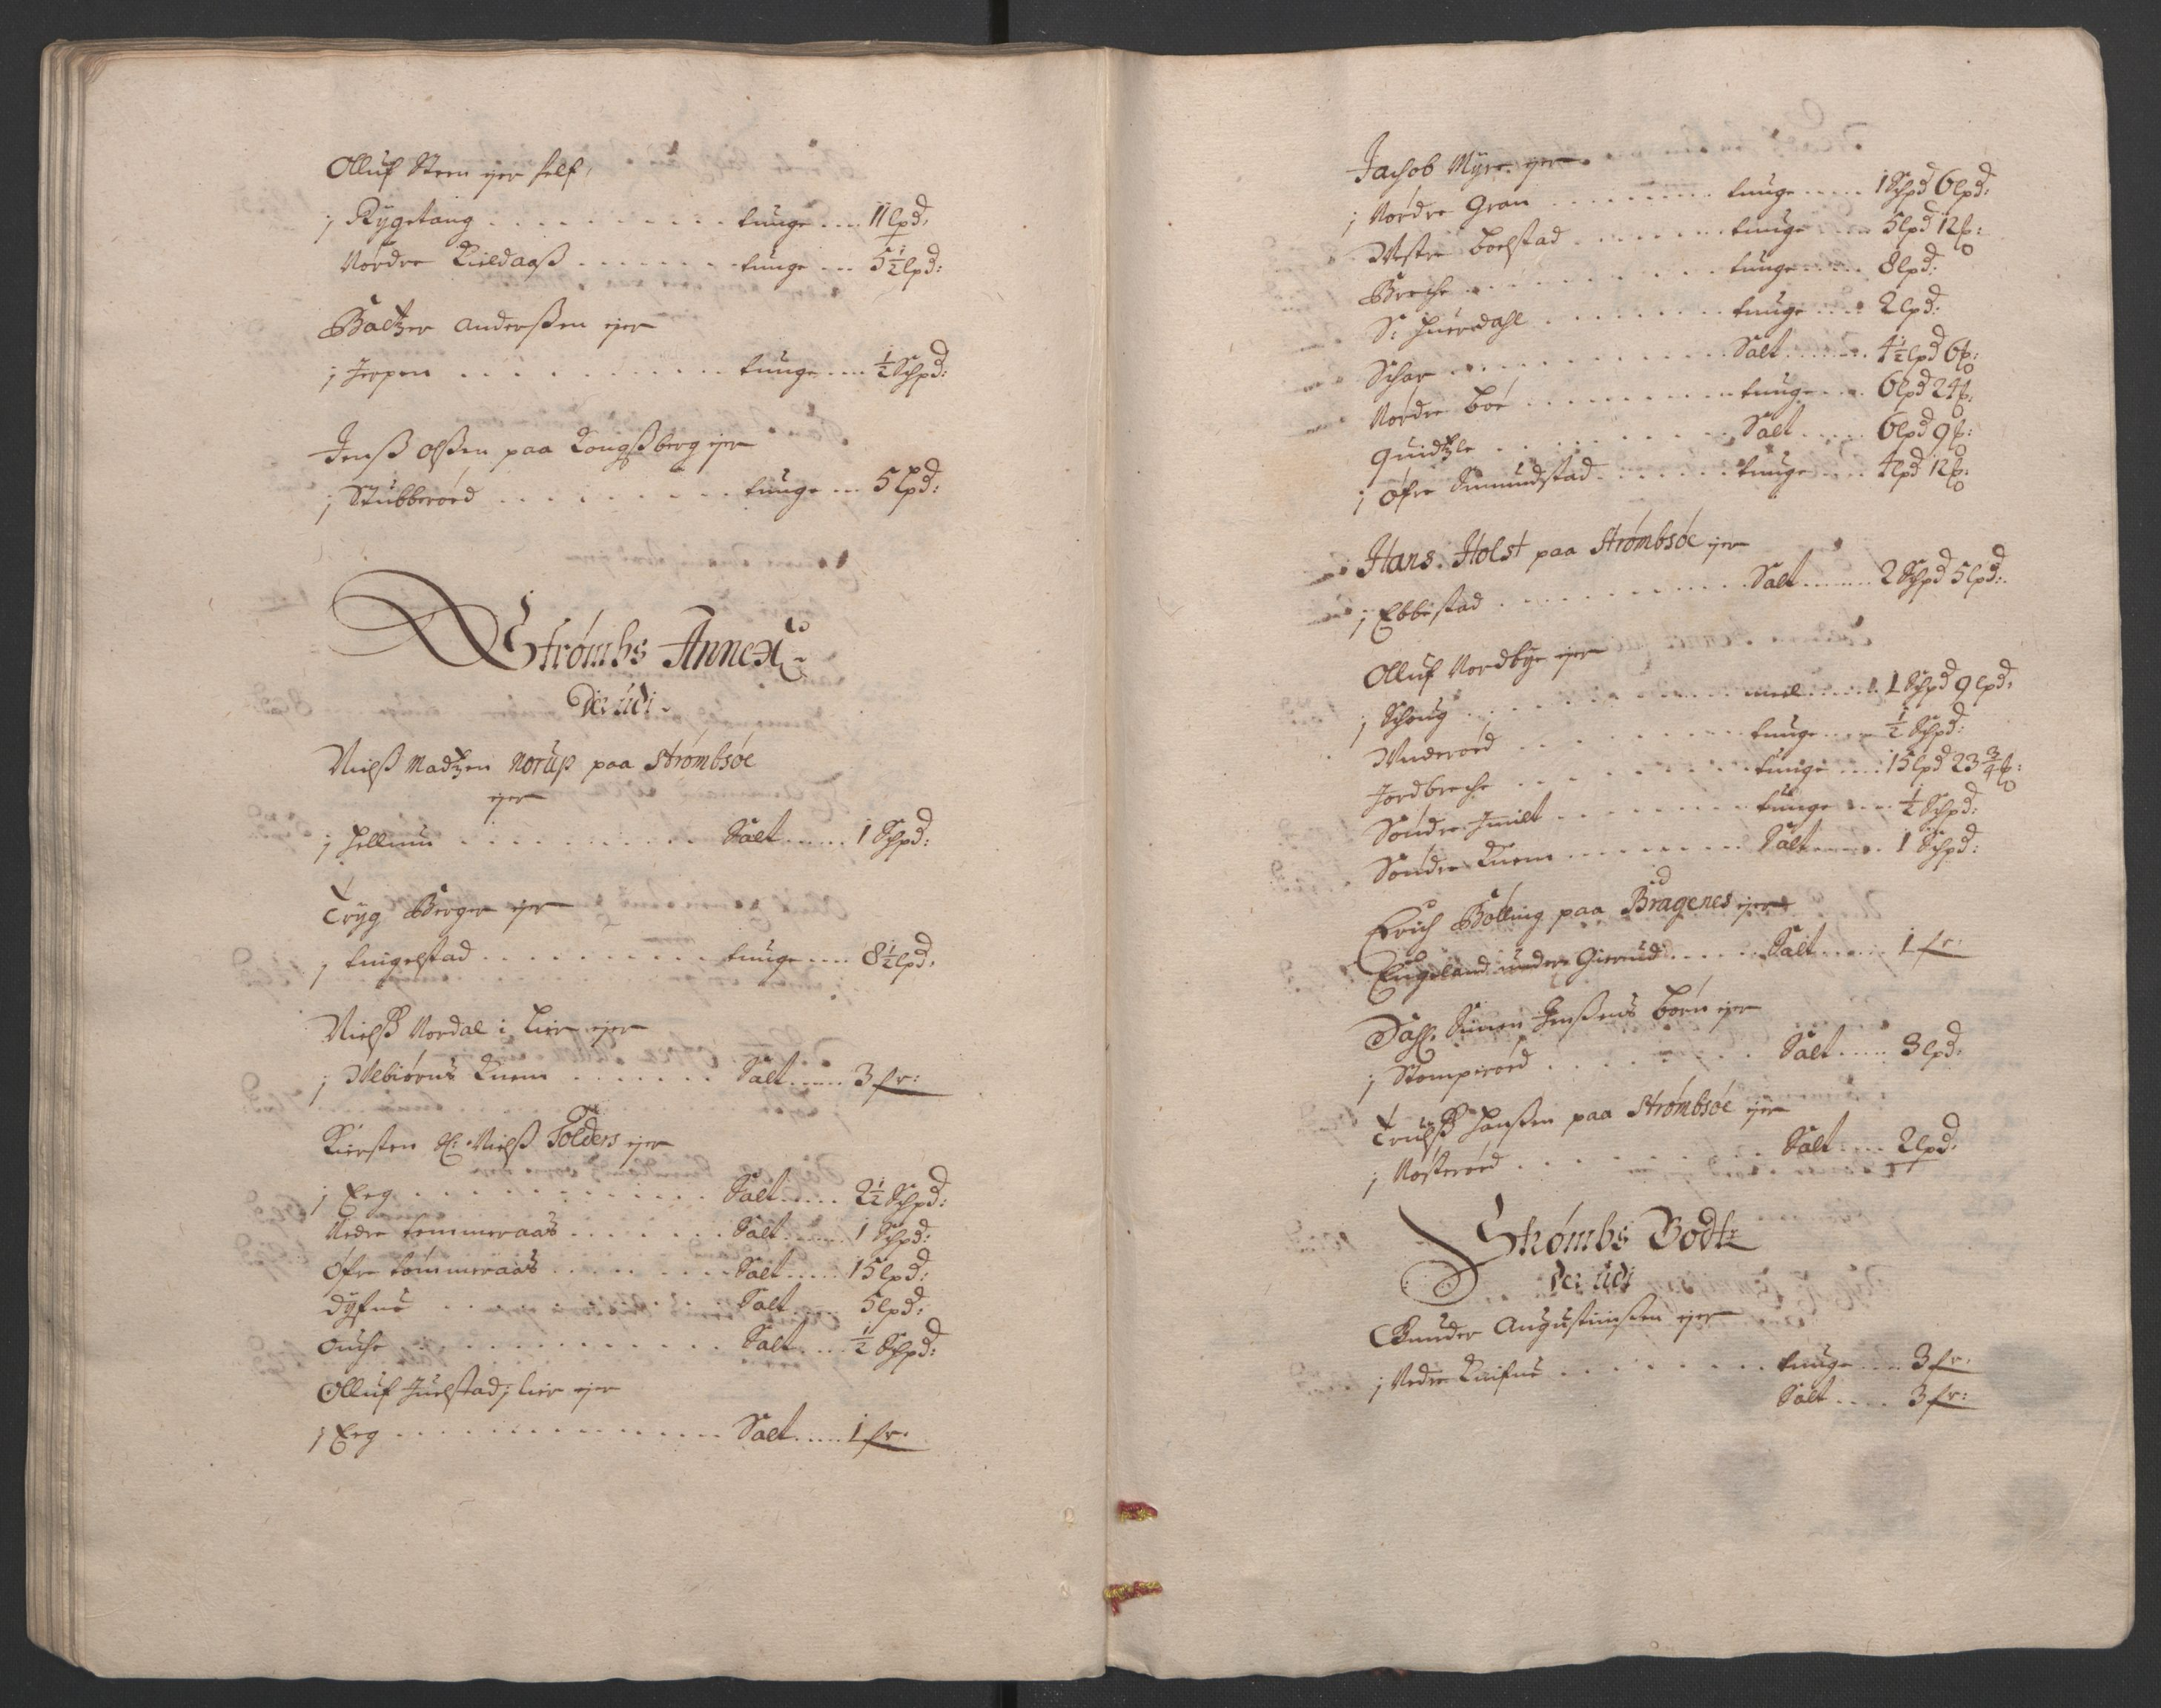 RA, Rentekammeret inntil 1814, Reviderte regnskaper, Fogderegnskap, R32/L1865: Fogderegnskap Jarlsberg grevskap, 1692, s. 203